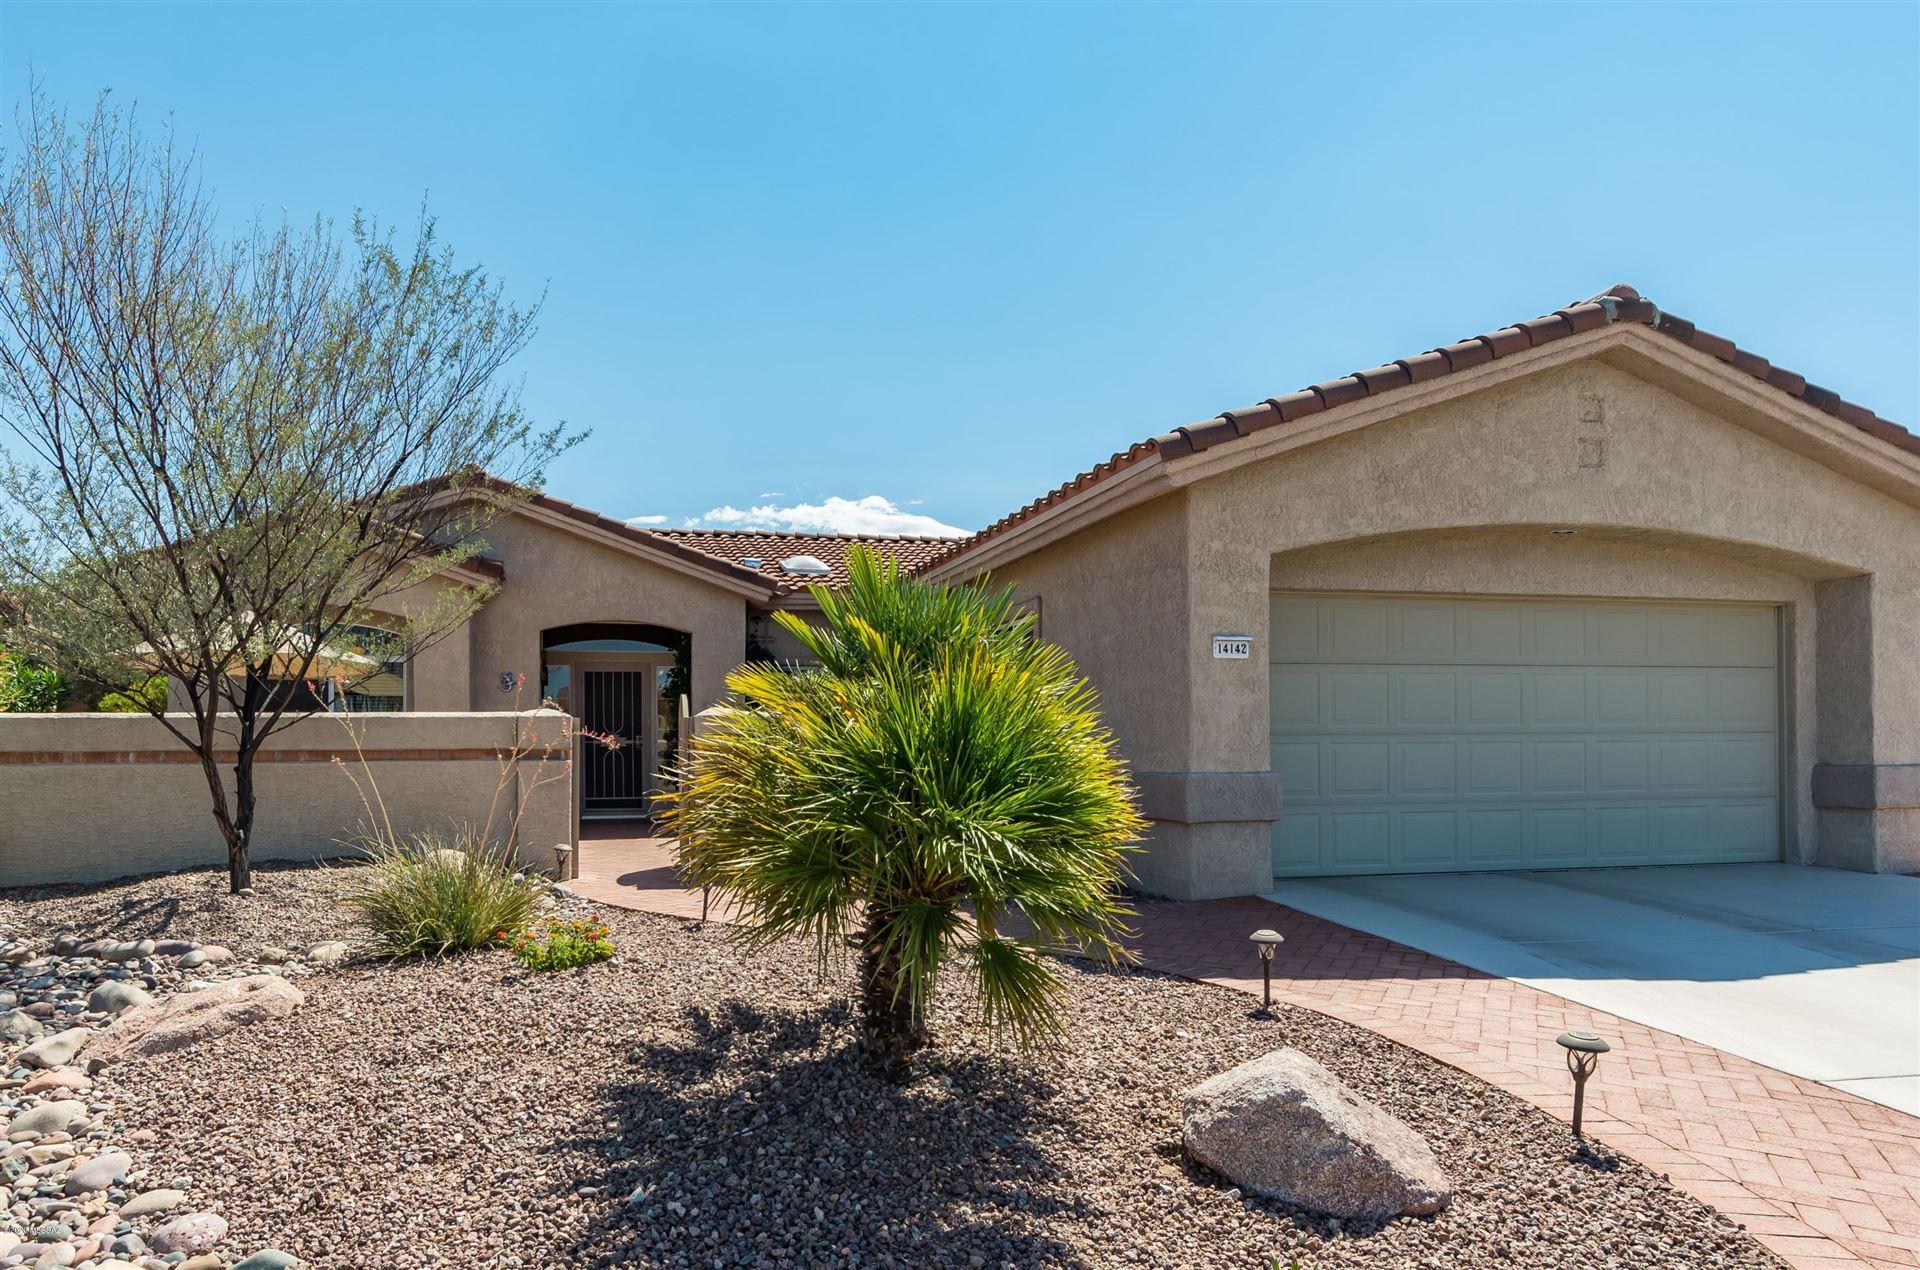 14142 N Buckingham Drive, Oro Valley, AZ 85755 - #: 22019422